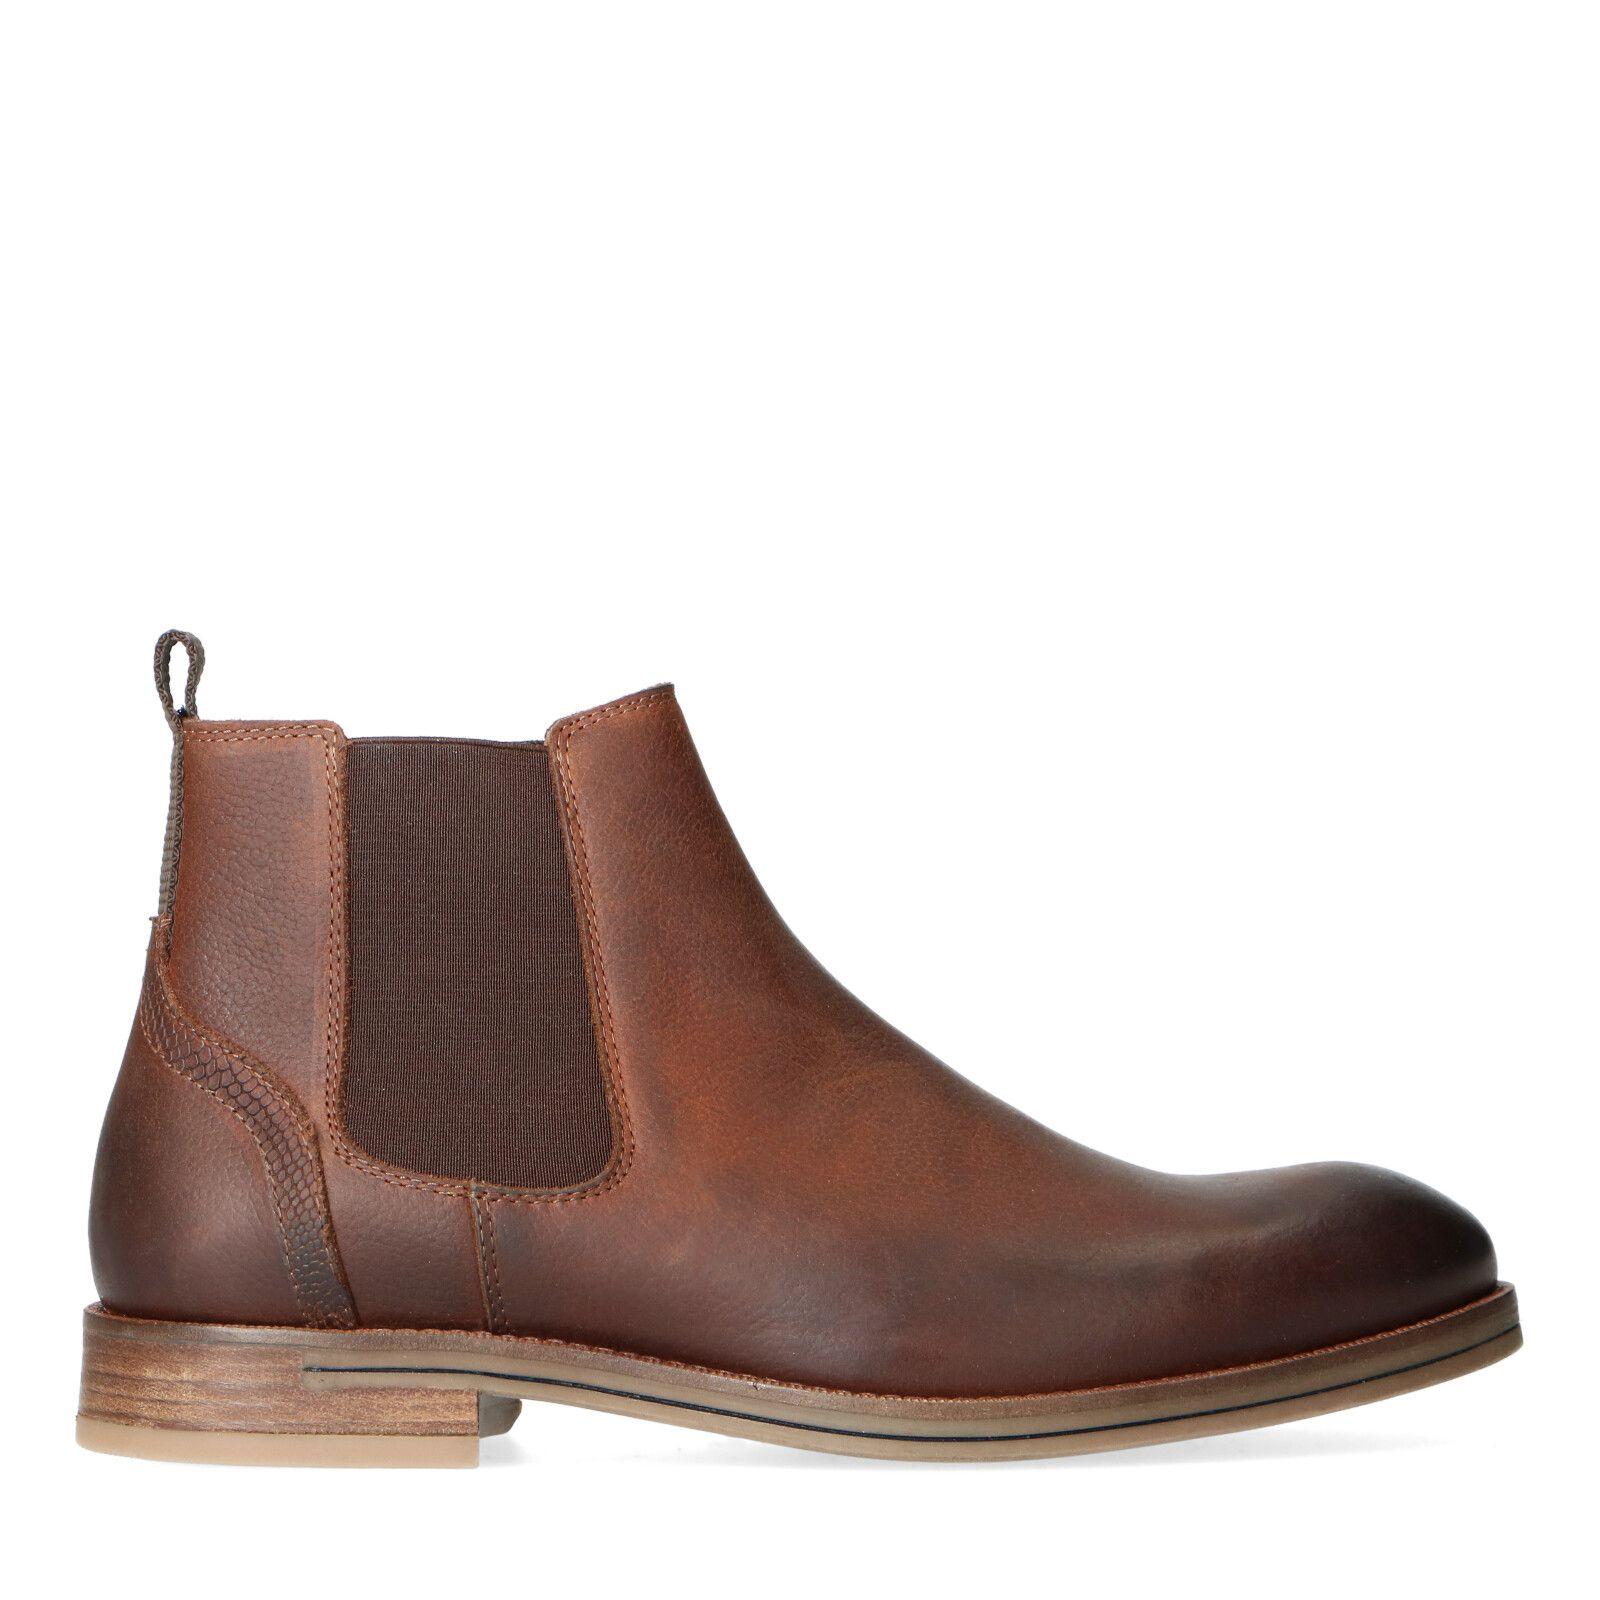 Sacha Bruine leren chelsea boots